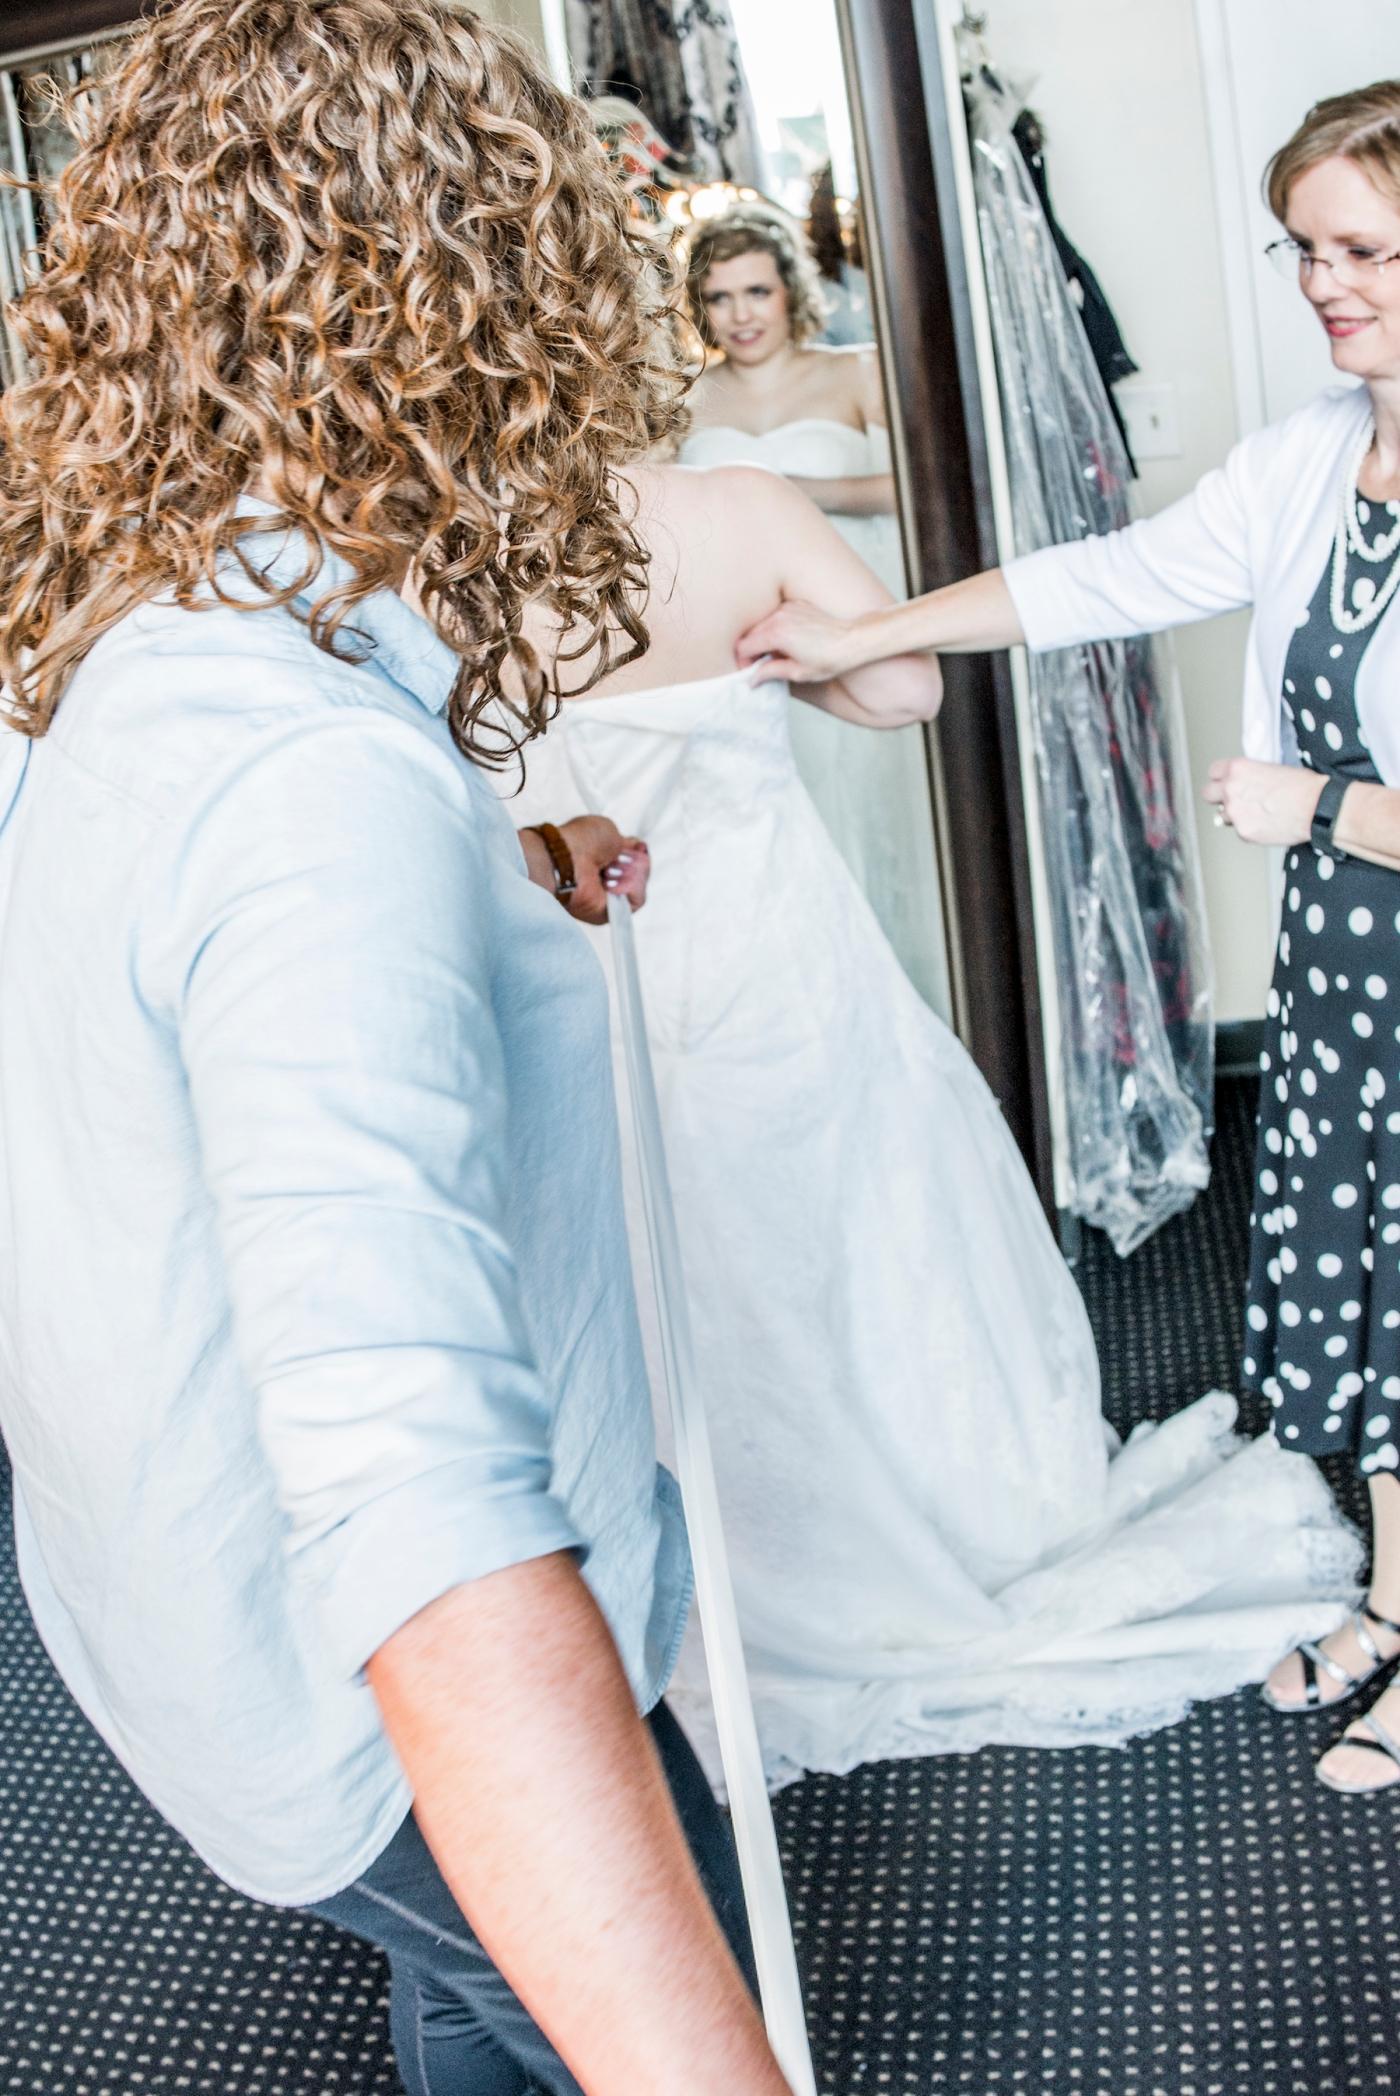 DSC_1858Everett_Wedding_Ballroom_Jane_Speleers_photography_Rachel_and_Edmund_Getting_ready_2017